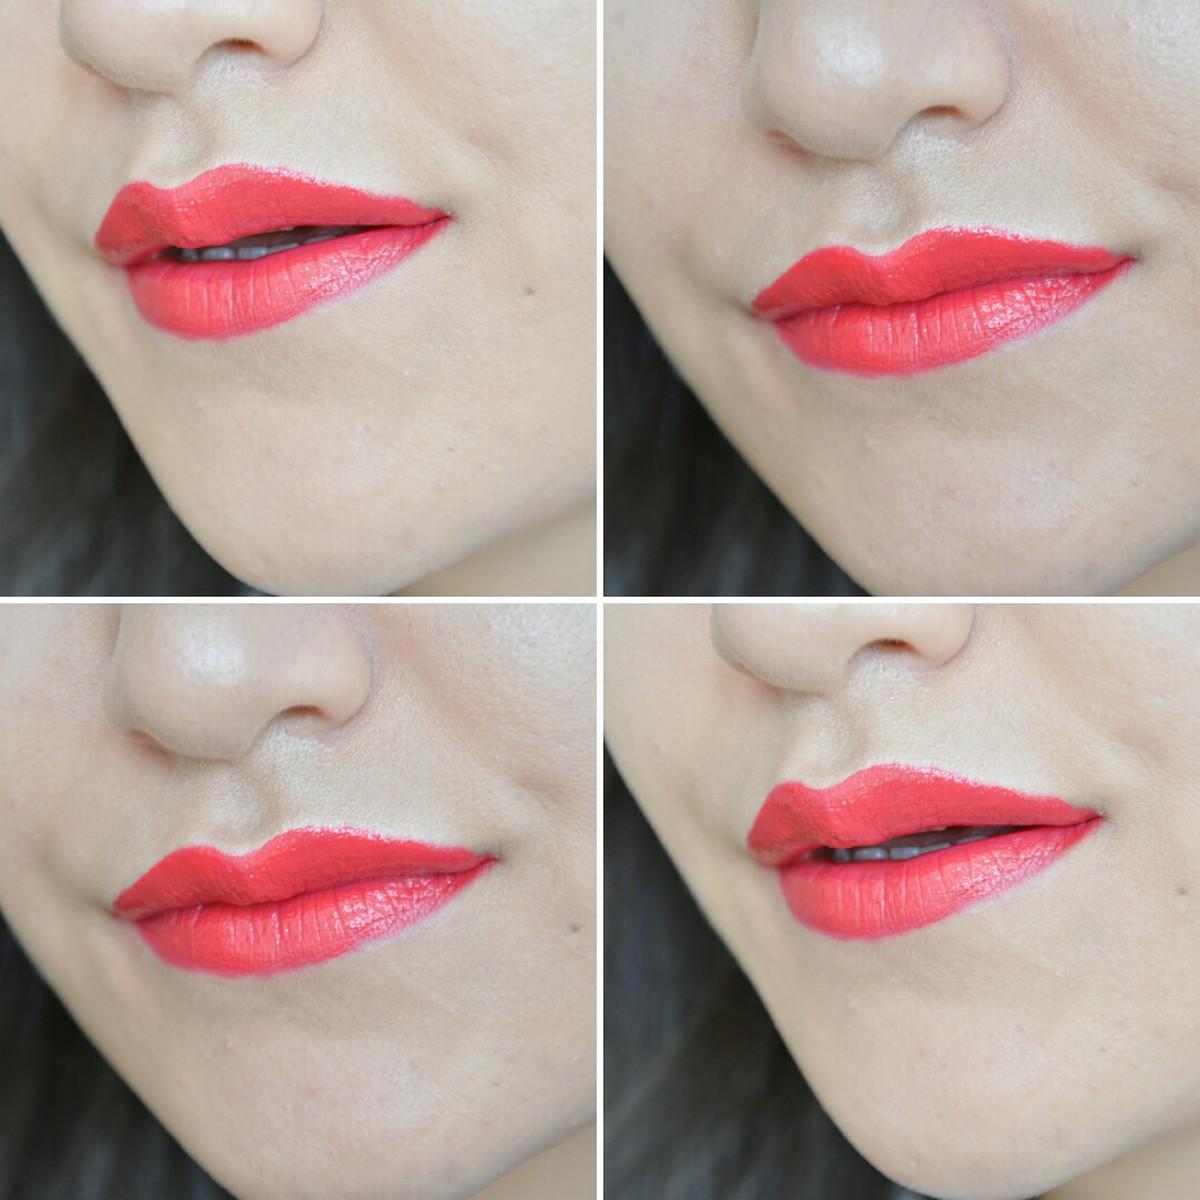 Kırmızı Lip Gloss Kullananlar Blog